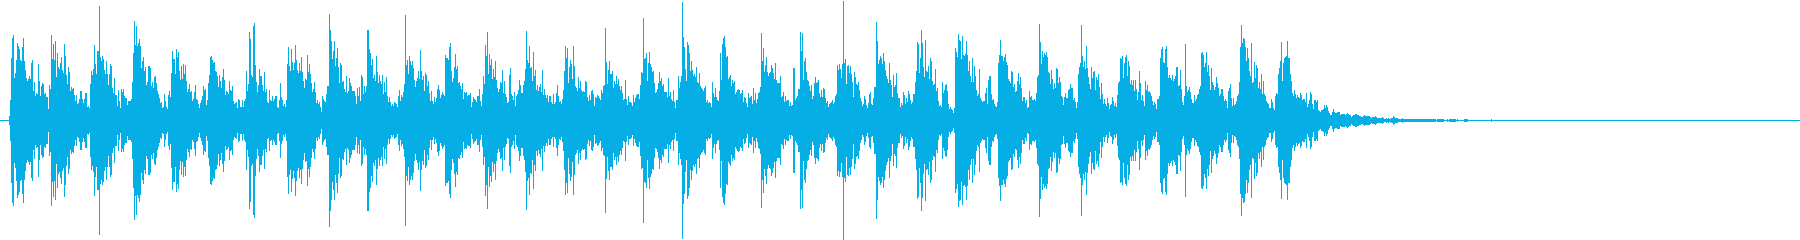 Xmasに最適トナカイベルのループ音04の再生済みの波形